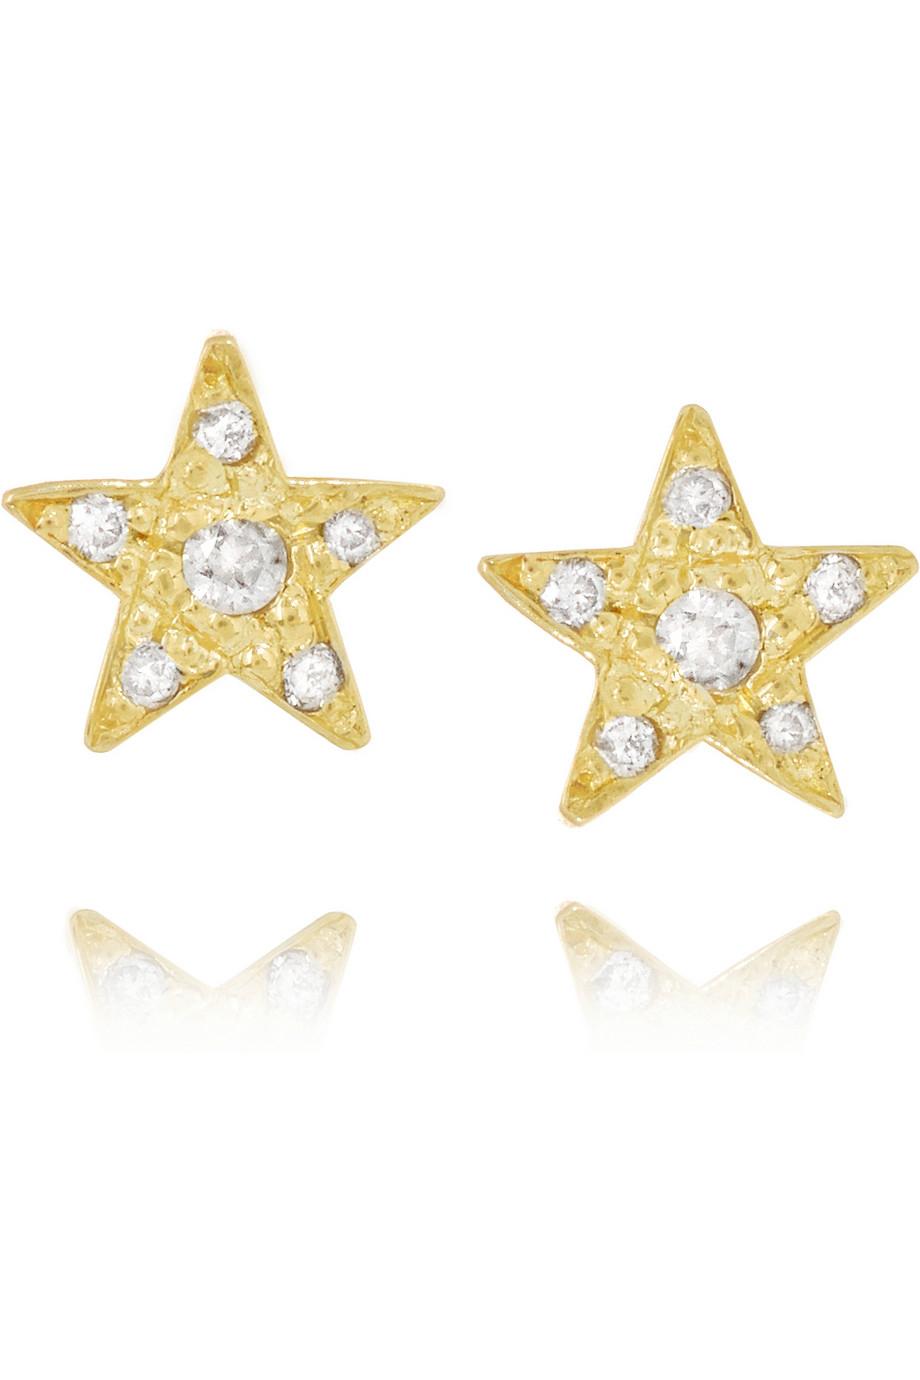 Jennifer Meyer Star 18-karat Gold Earrings fproq